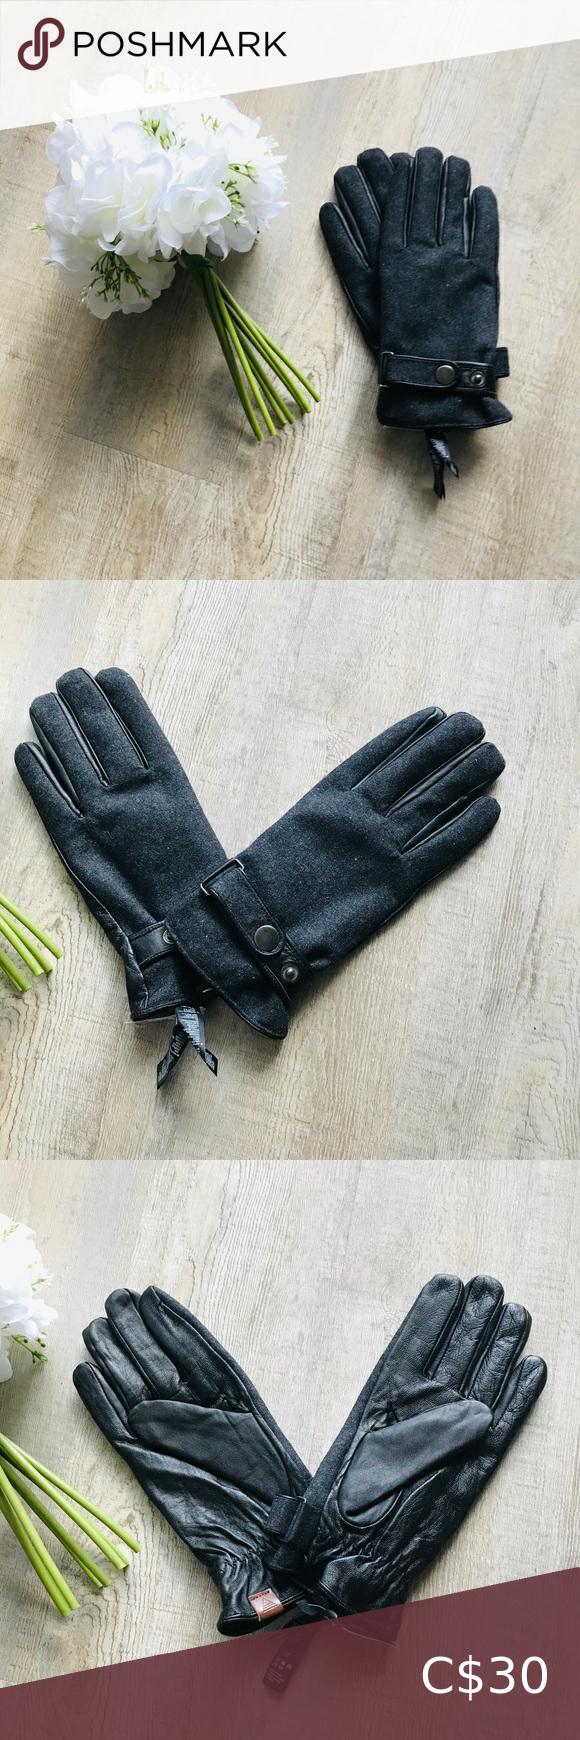 Aldo Brand New Leather Warm Gloves Women Ladies Al